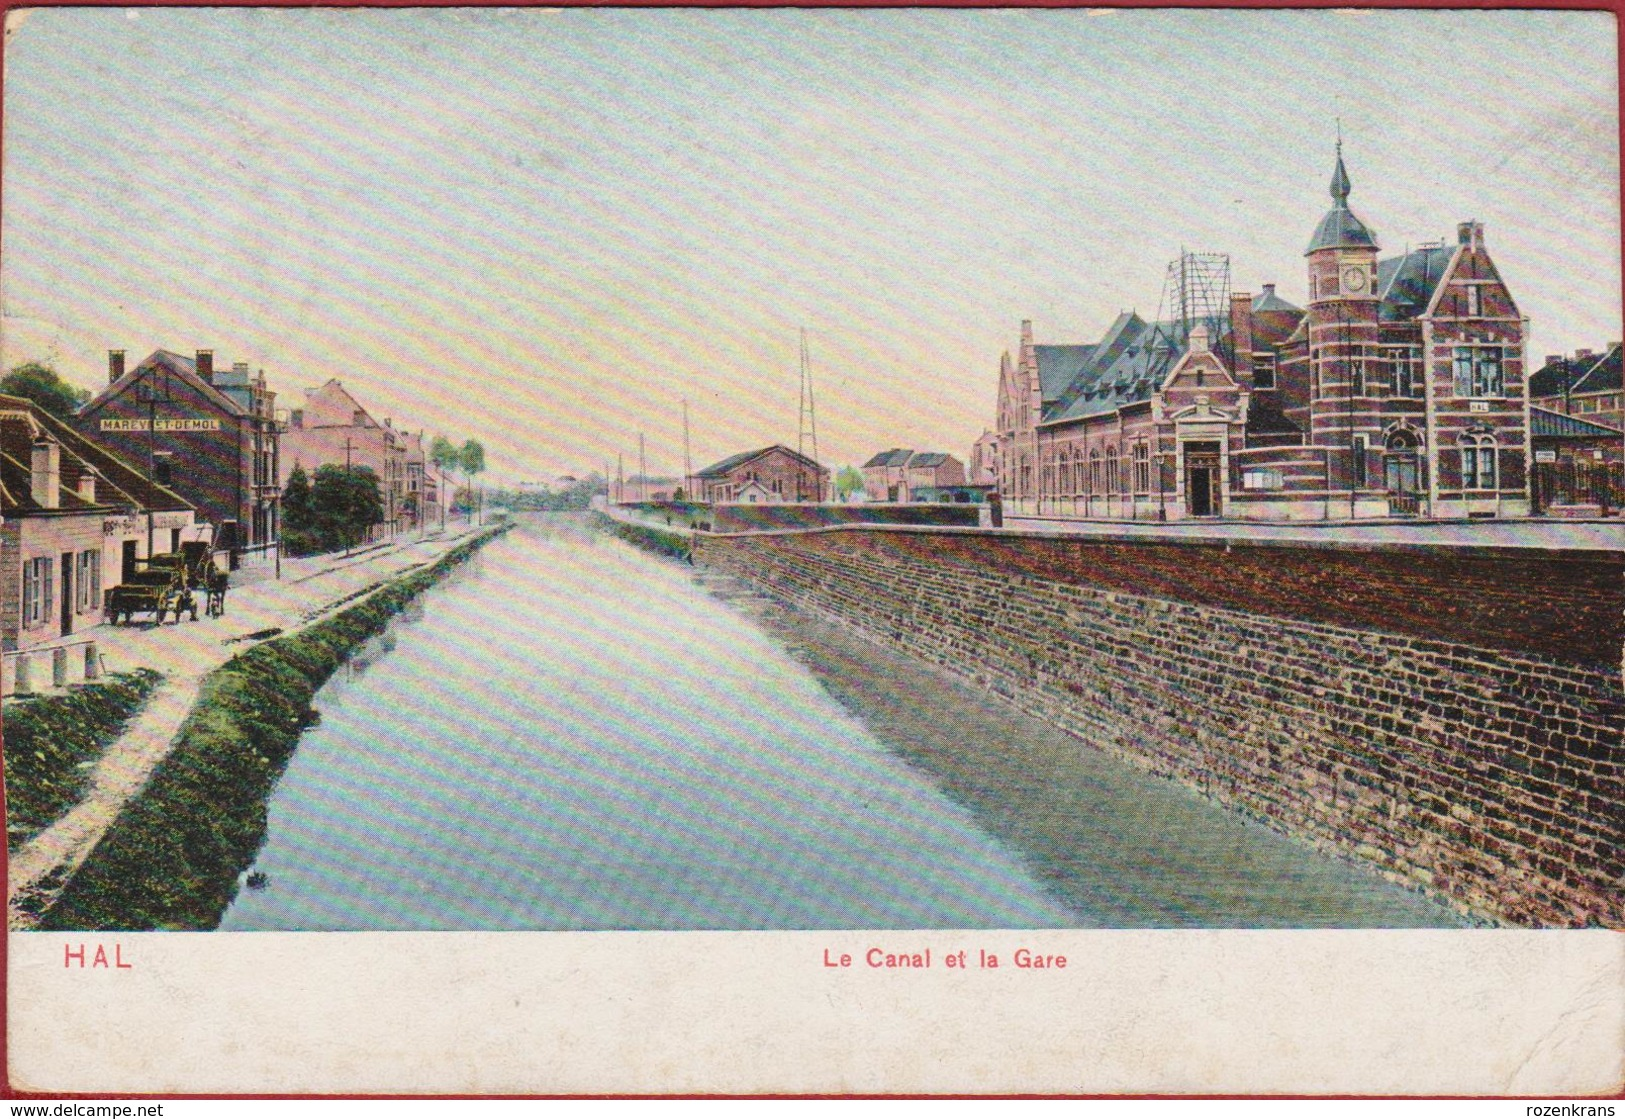 Halle Hal Le Canal Et La Gare Kanaal En Station - Halle